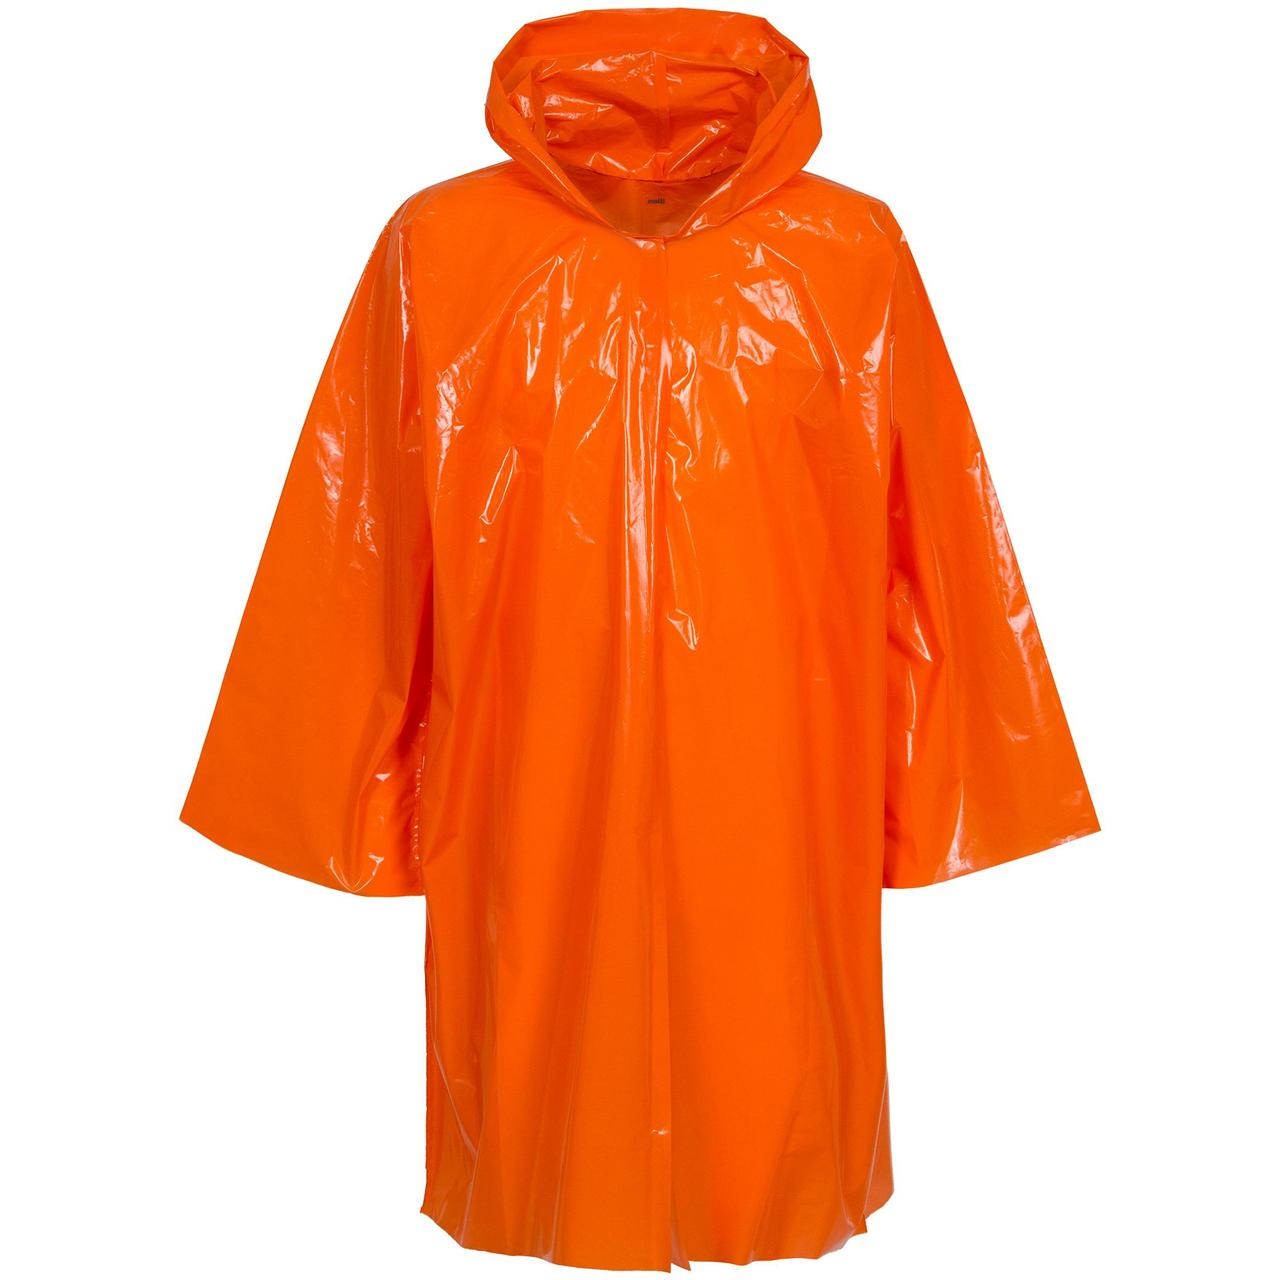 Дождевик-плащ CloudTime, оранжевый (артикул 11876.20)